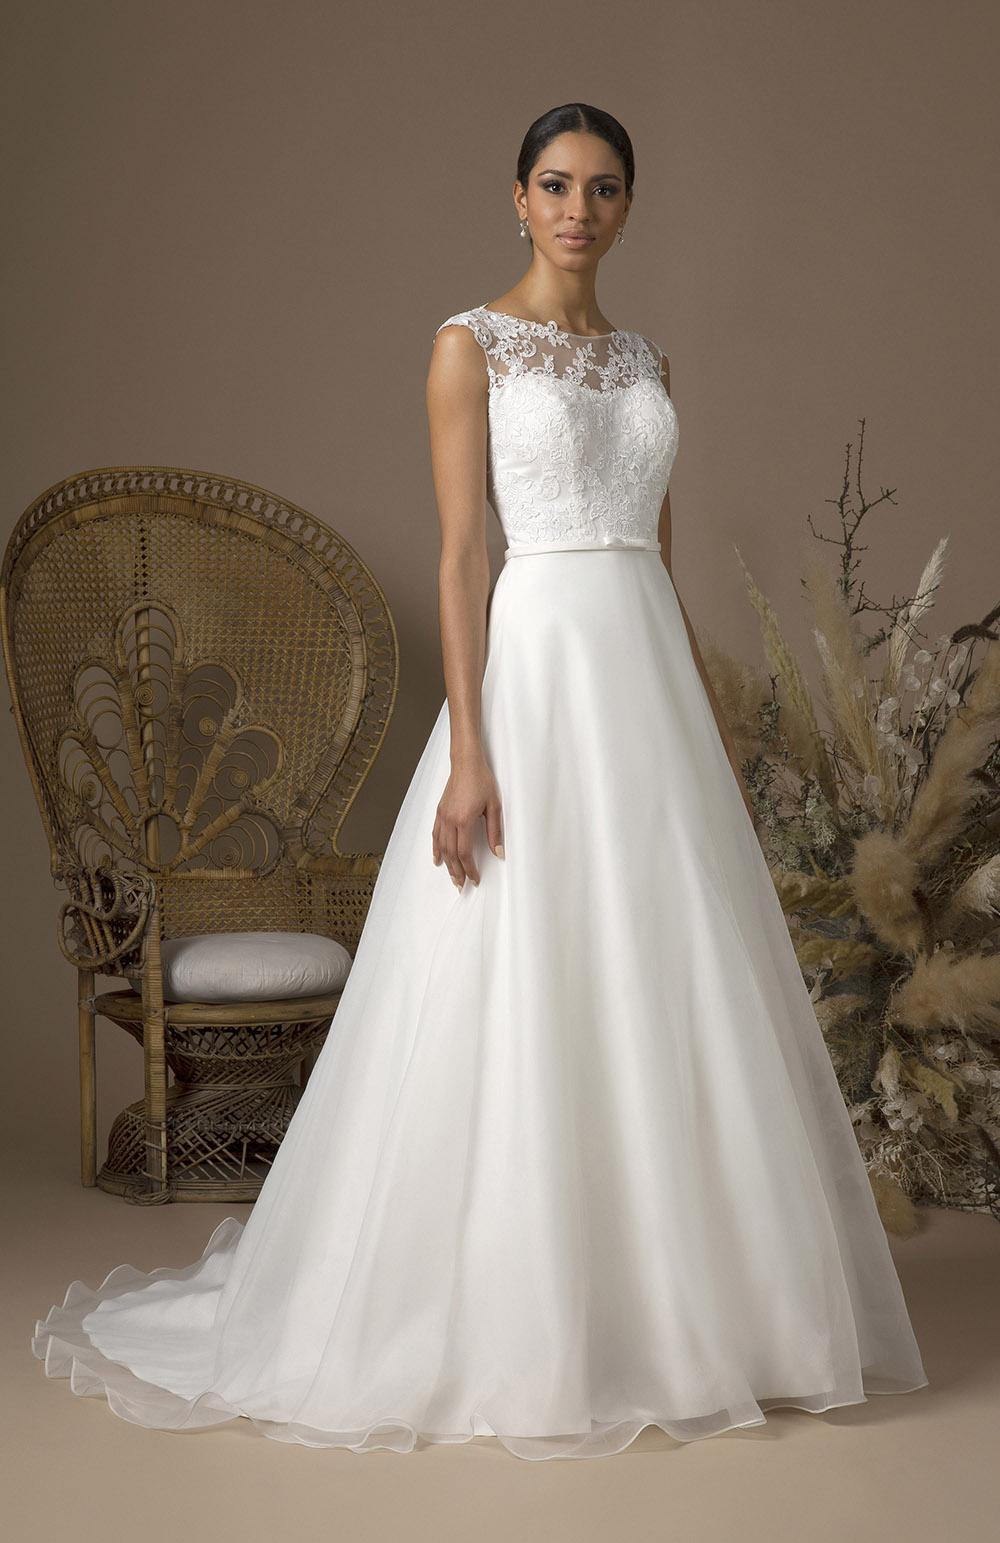 Robe de mariée Modèle Dema